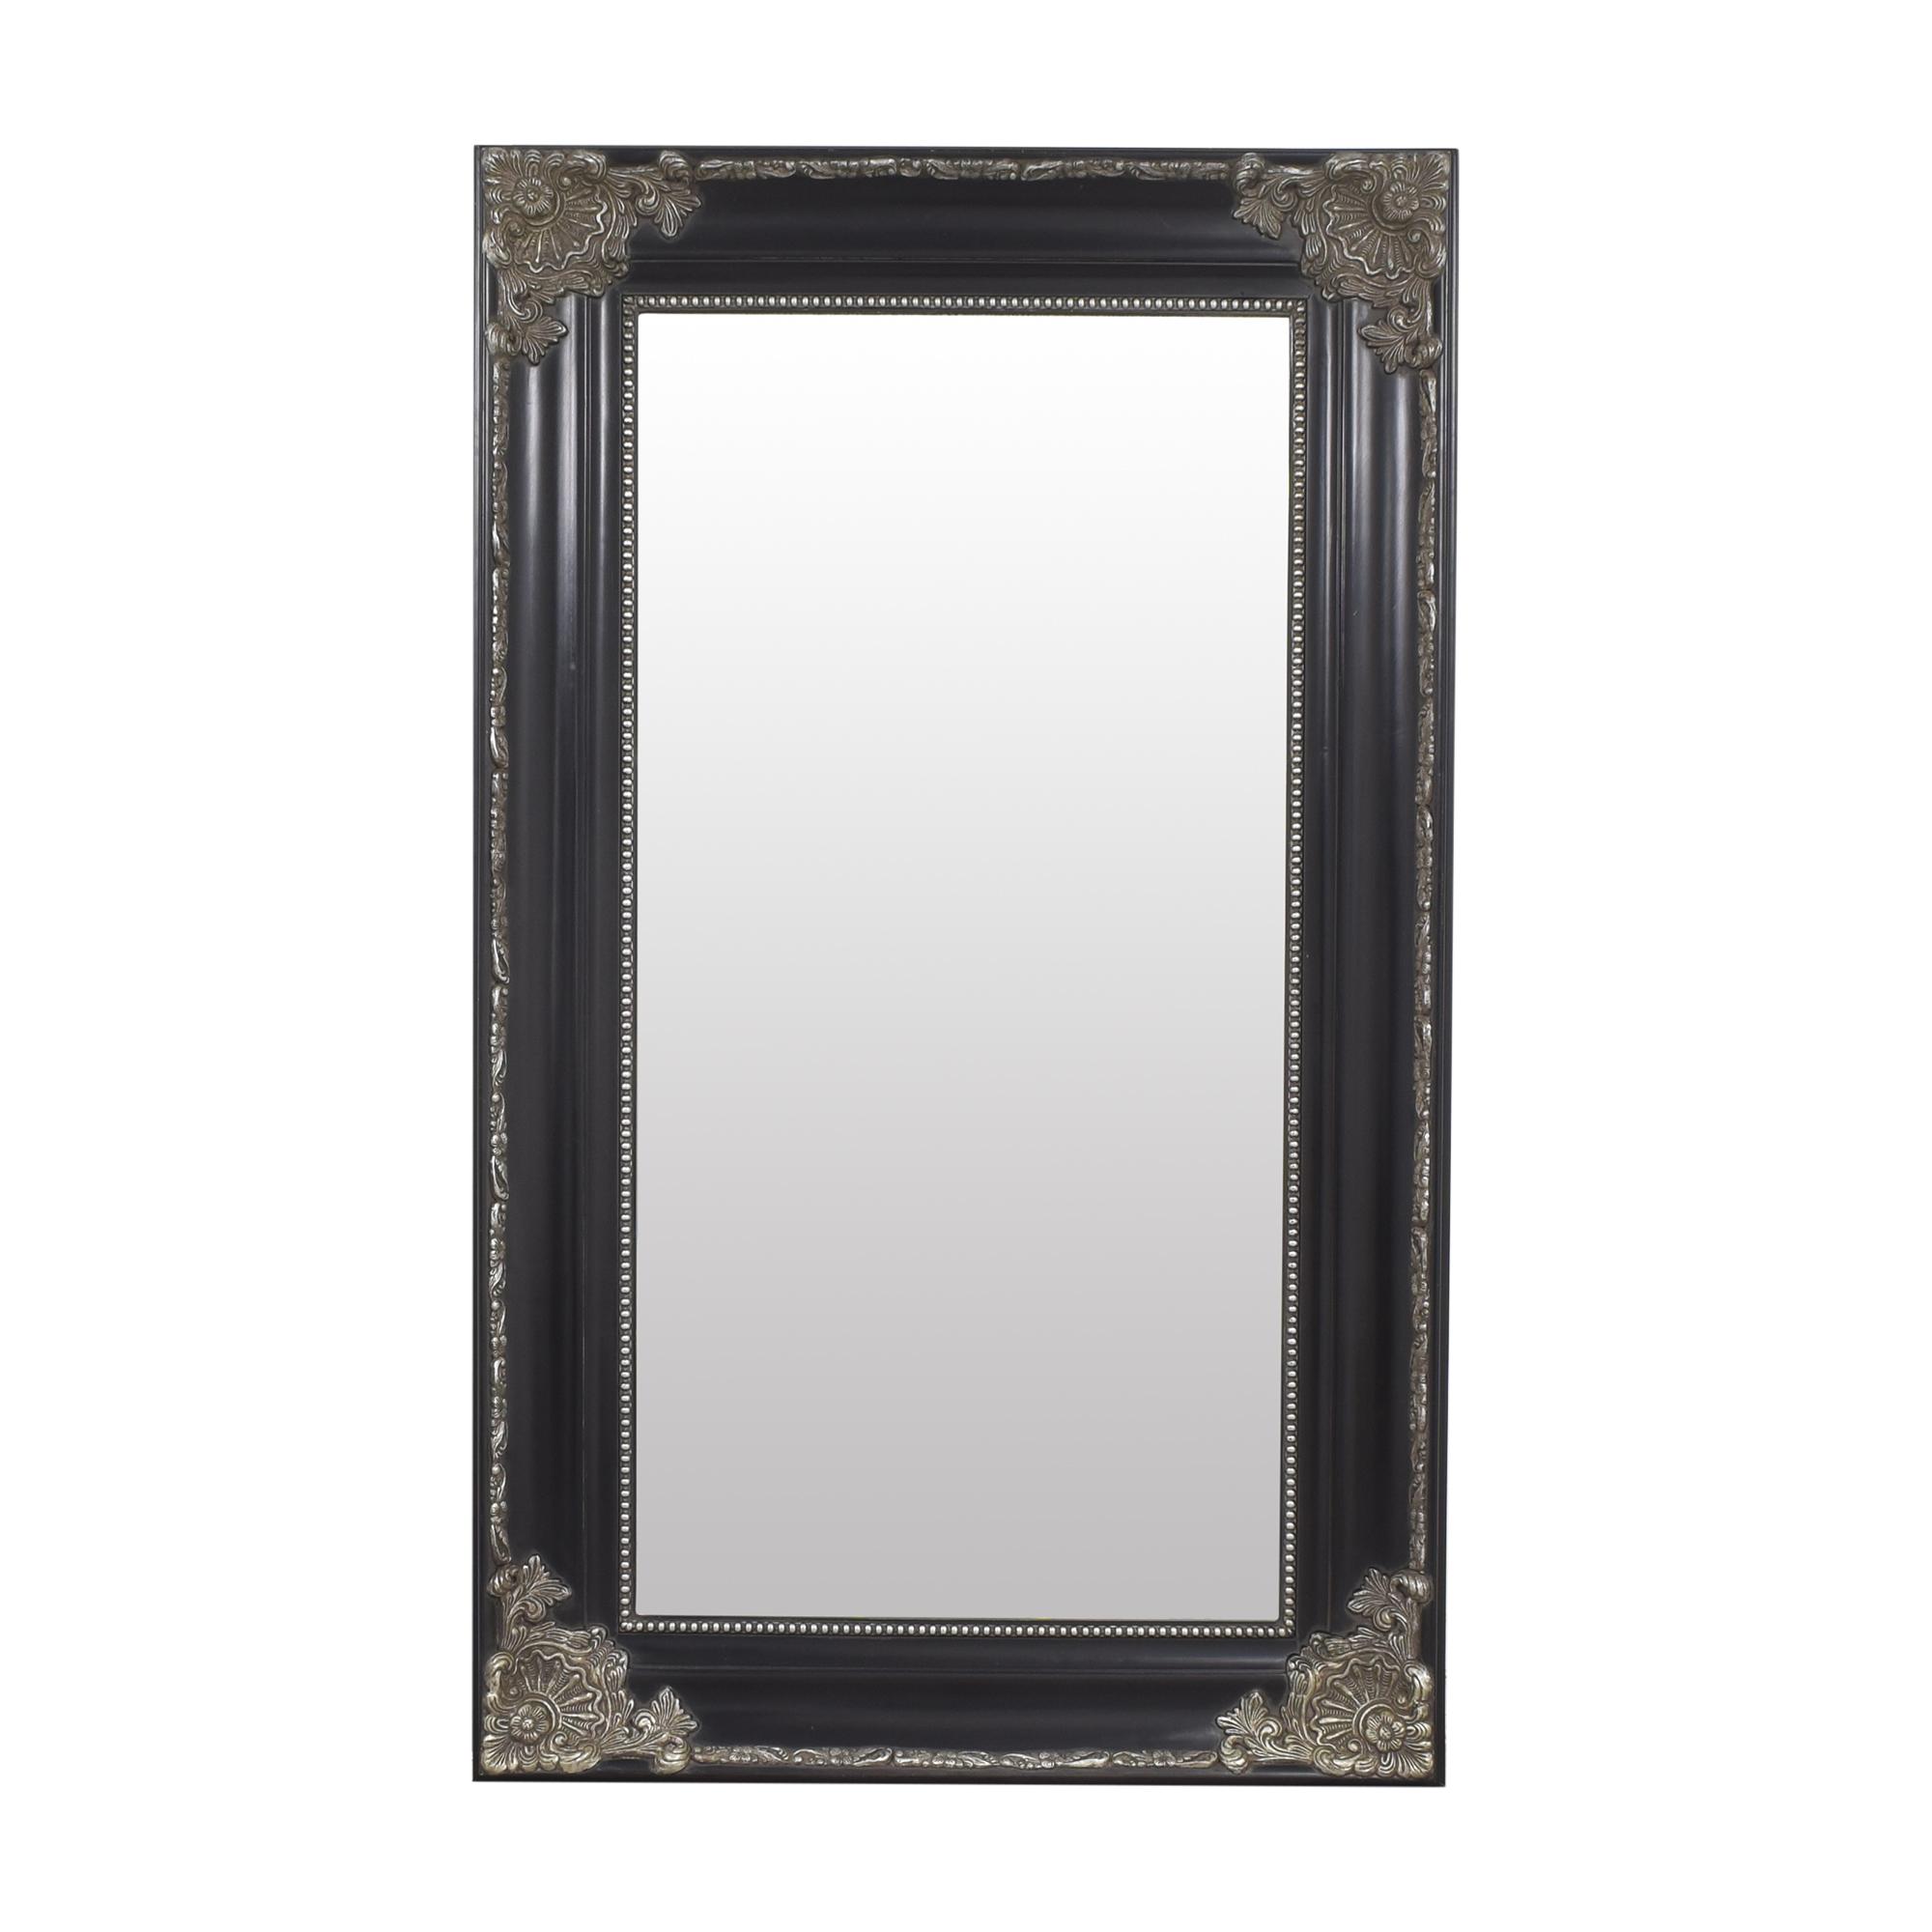 Custom Decorative Framed Wall Mirror pa